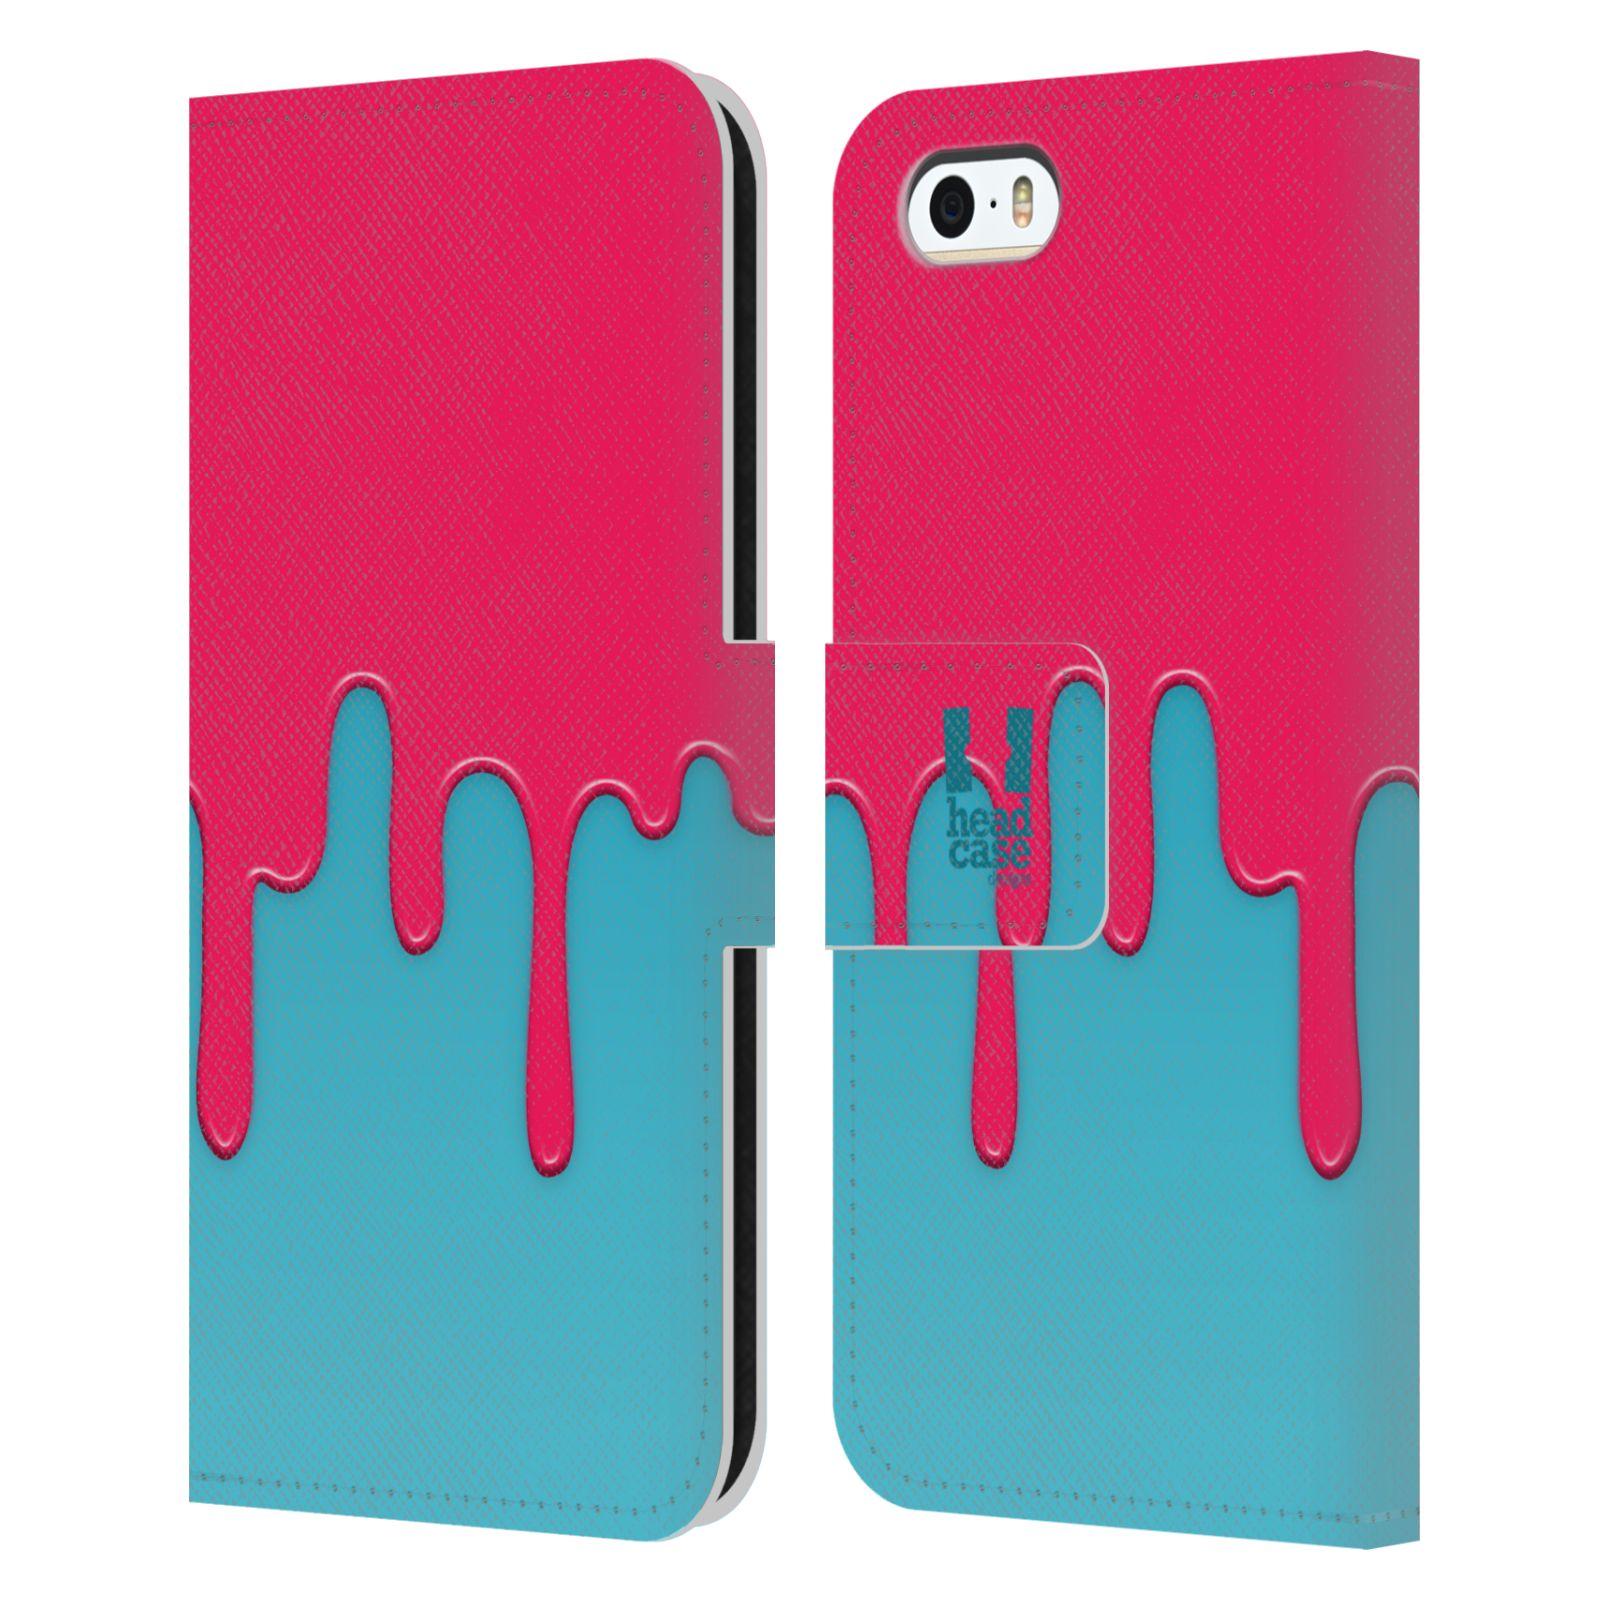 HEAD CASE Flipové pouzdro pro mobil Apple Iphone 5/5s Rozlitá barva růžová a modrá